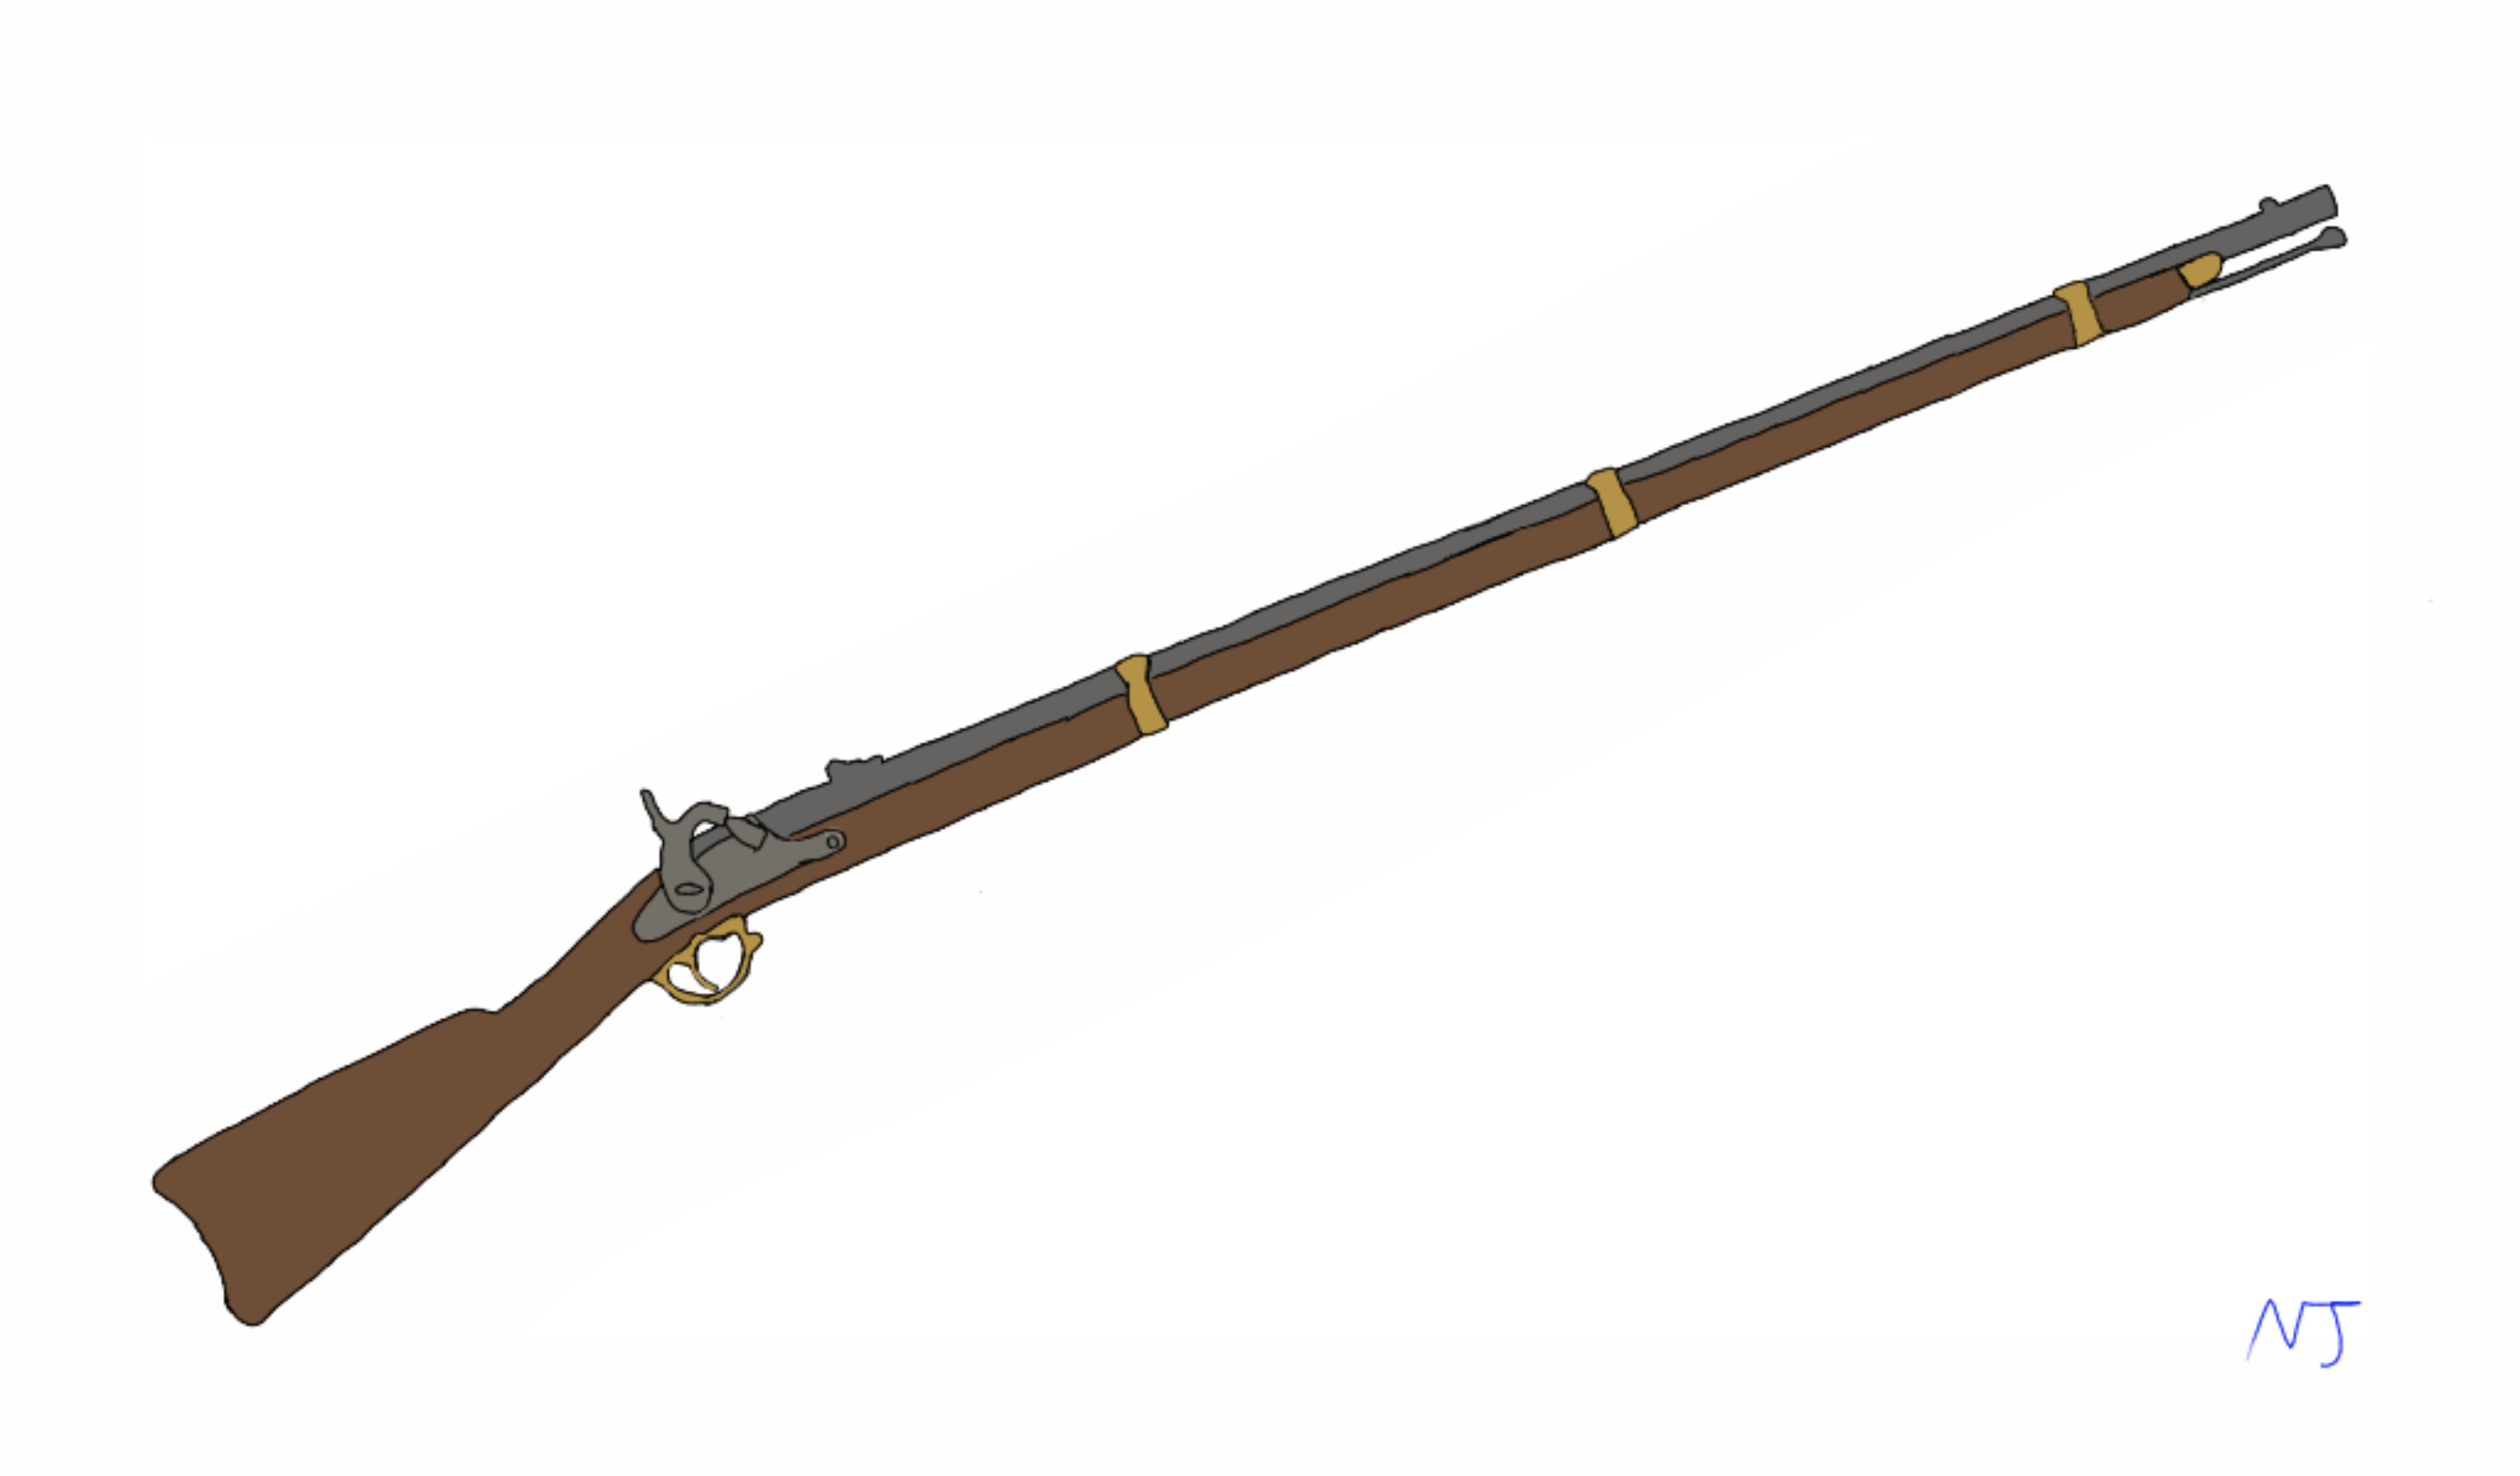 Suzuki Gsx 1100 additionally Watch moreover 10043 furthermore Enfield Tower 1861 Artillery Carbine Csa Confederate Civil War additionally Watch. on civil war enfield